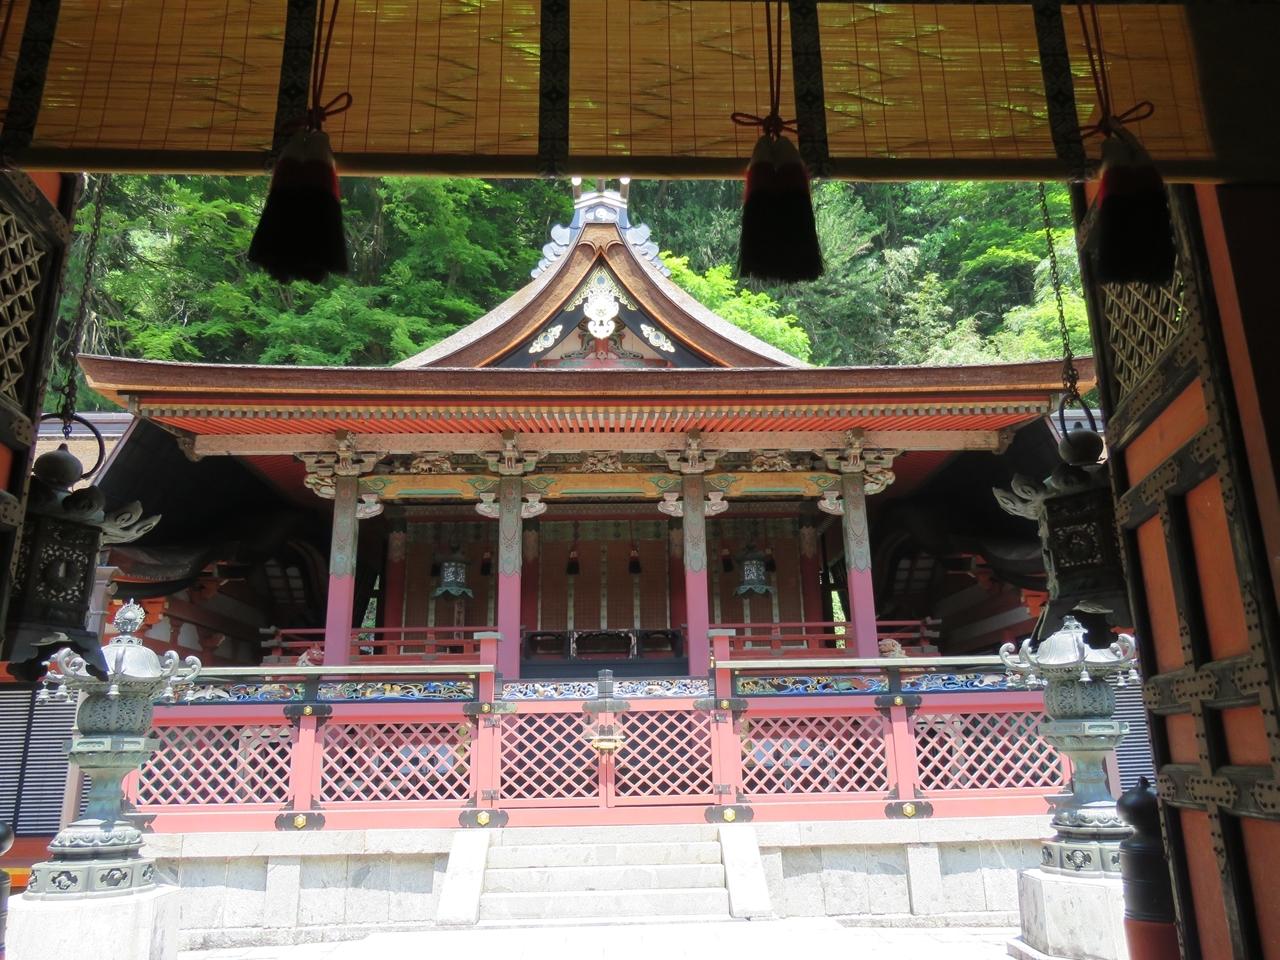 s-談山神社本殿